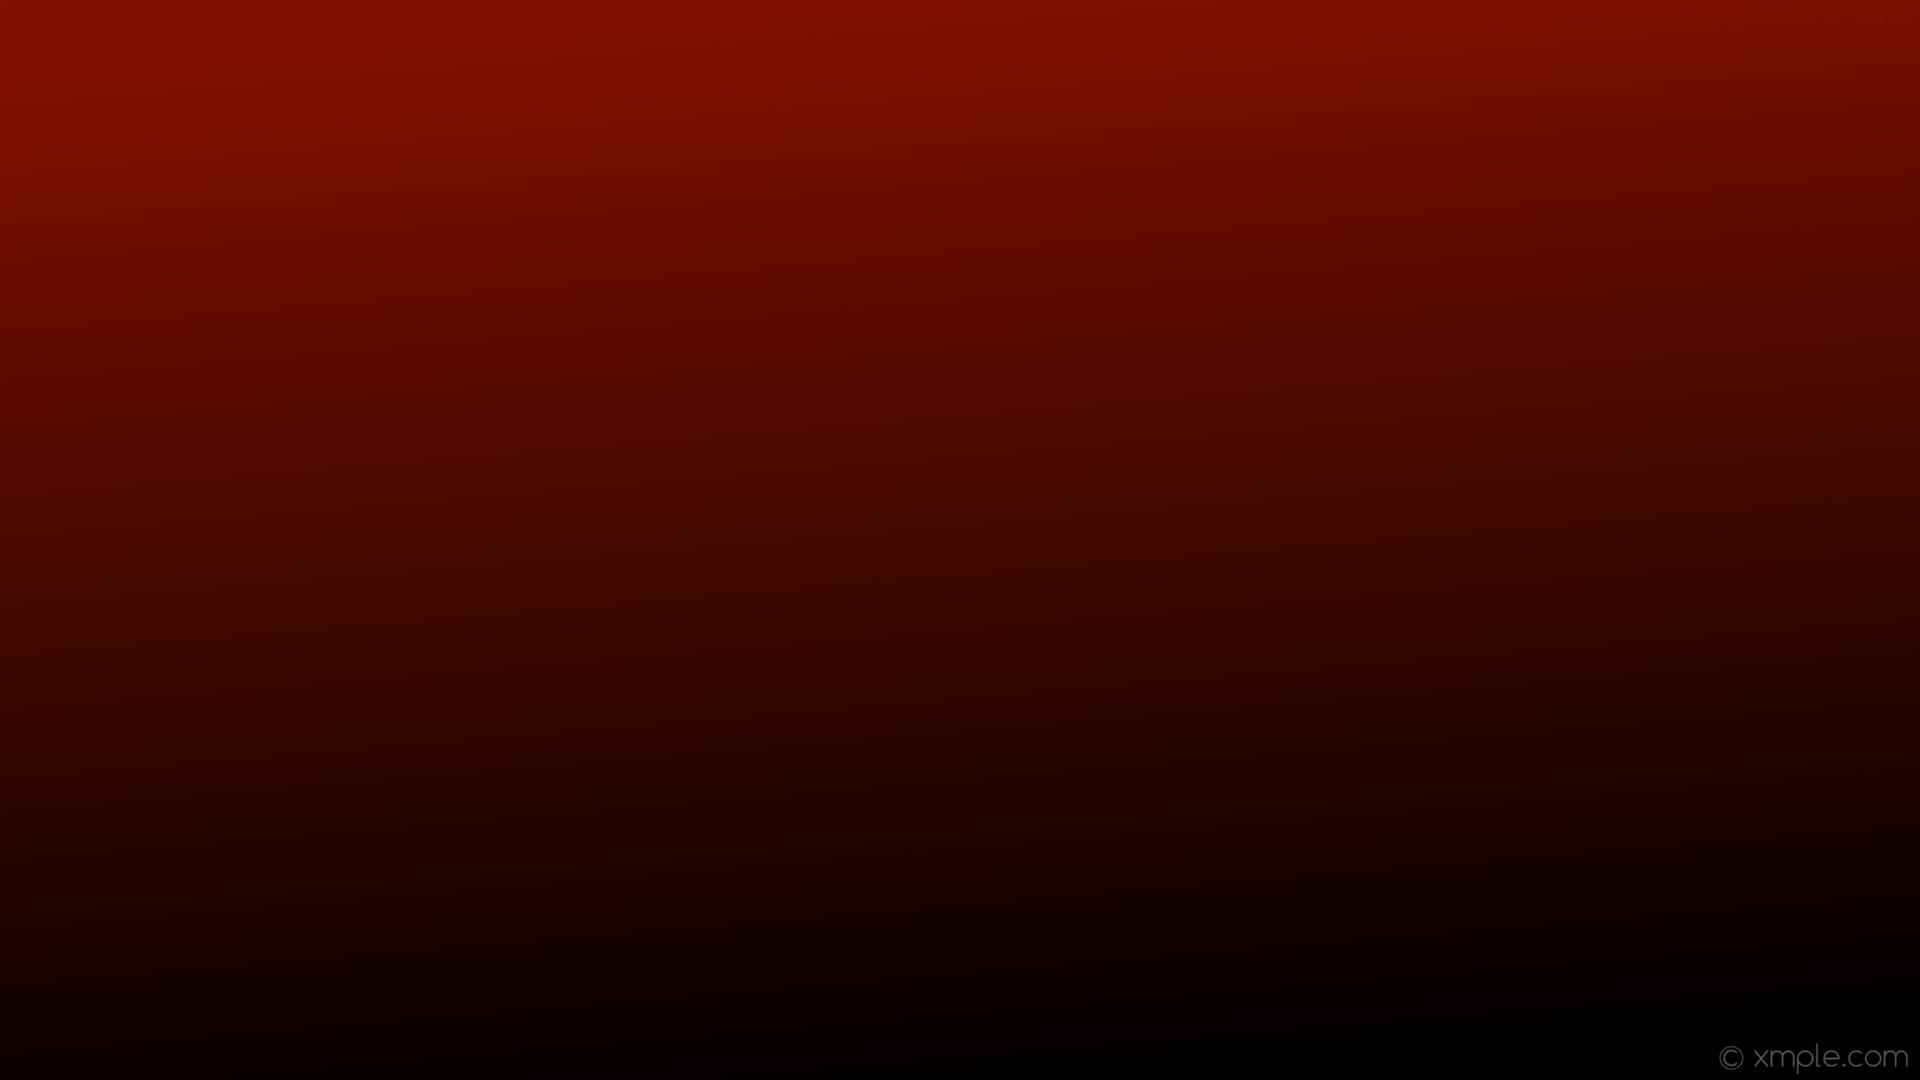 wallpaper red black gradient linear #811000 #010000 105°